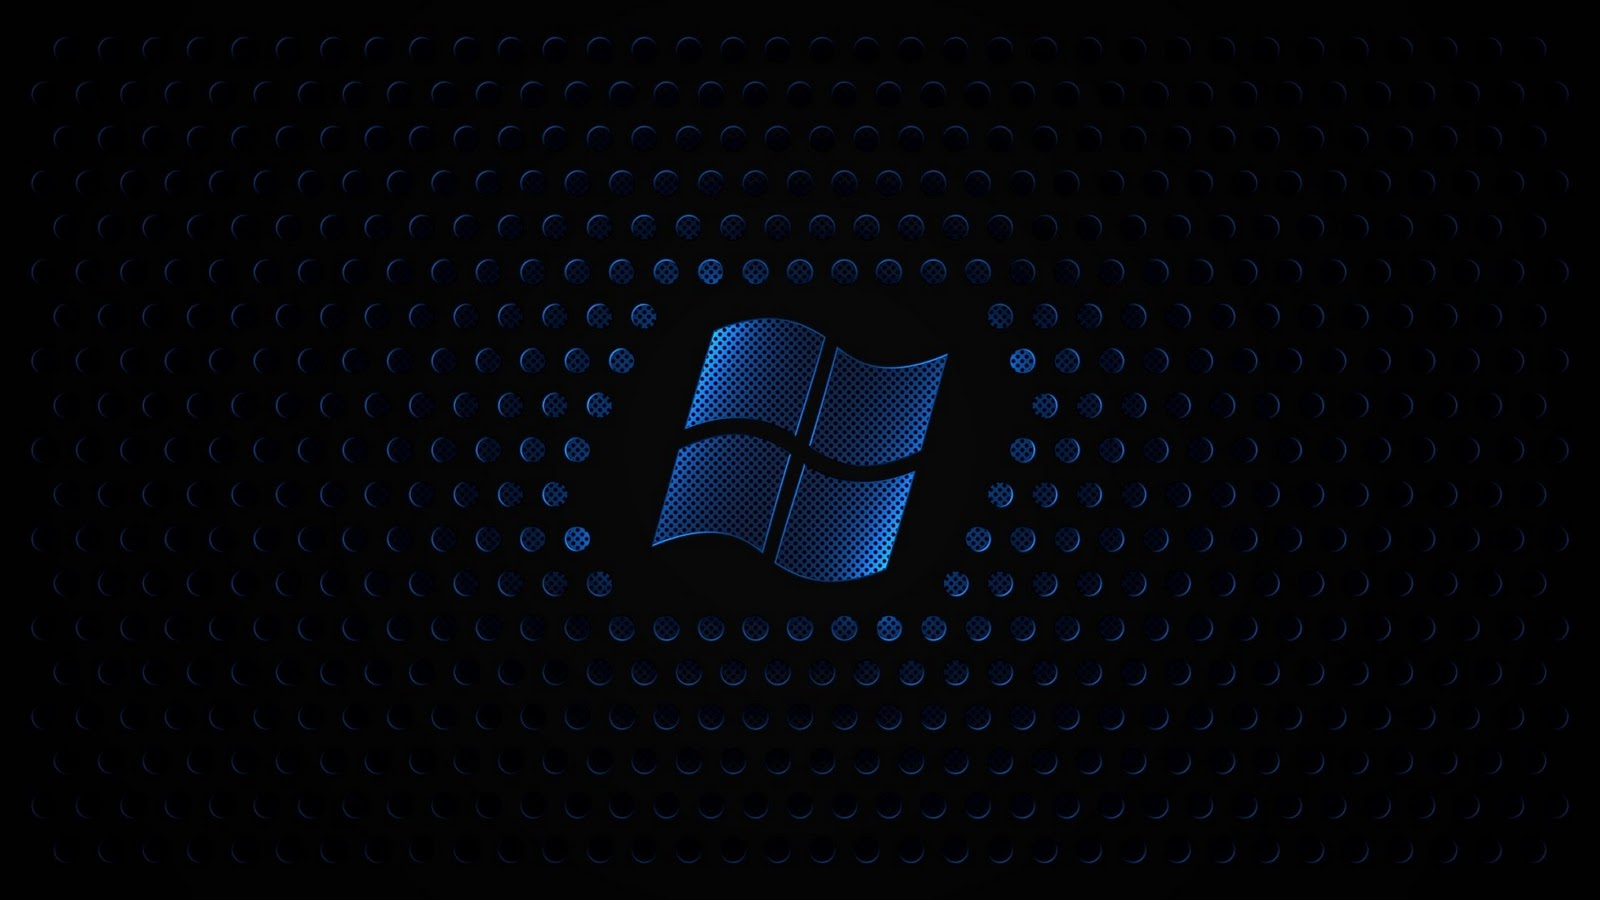 http://4.bp.blogspot.com/-QznxOot_Ogc/TruzmzRsyII/AAAAAAAARBE/GCZjDoOjunU/s1600/Mooie-windows-achtergronden-leuke-hd-windows-wallpapers-afbeelding-plaatje-19.jpg